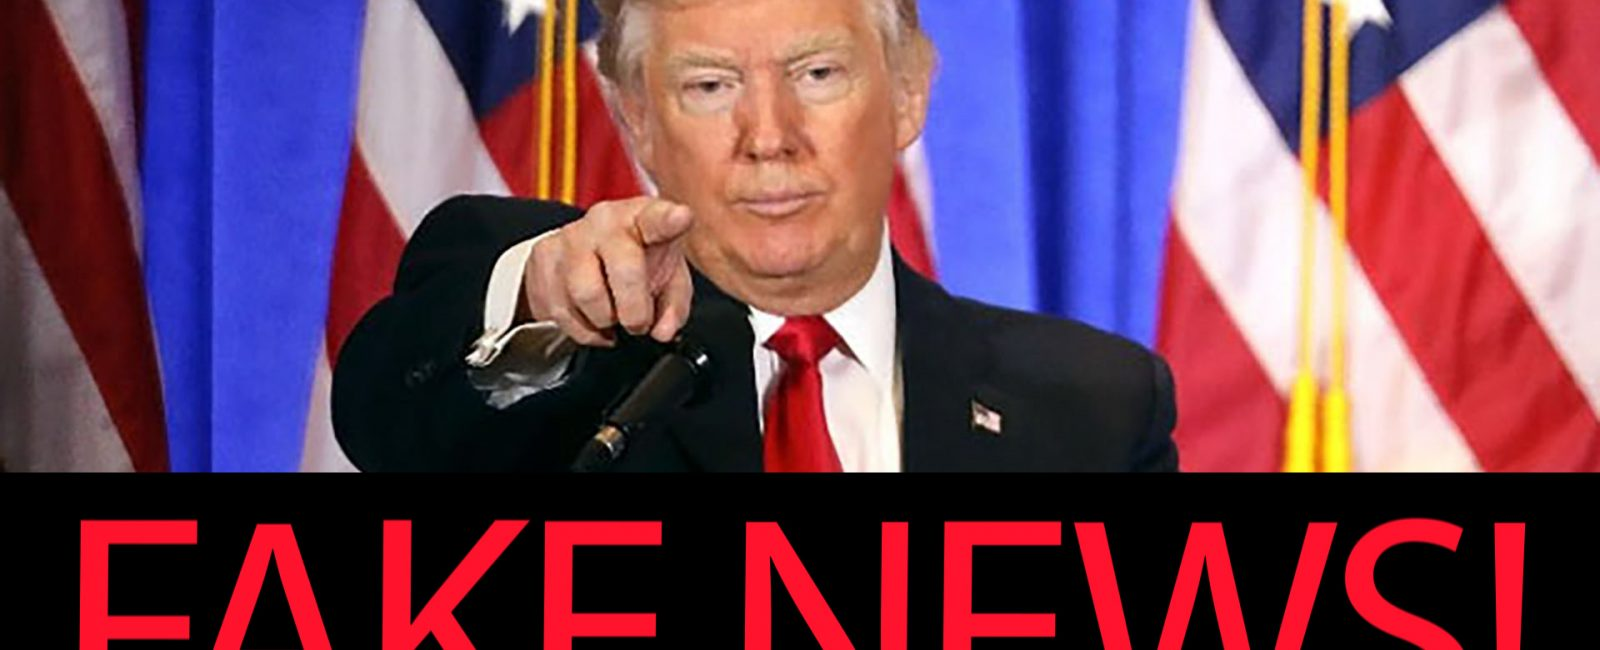 Donald Trump_FakeNews